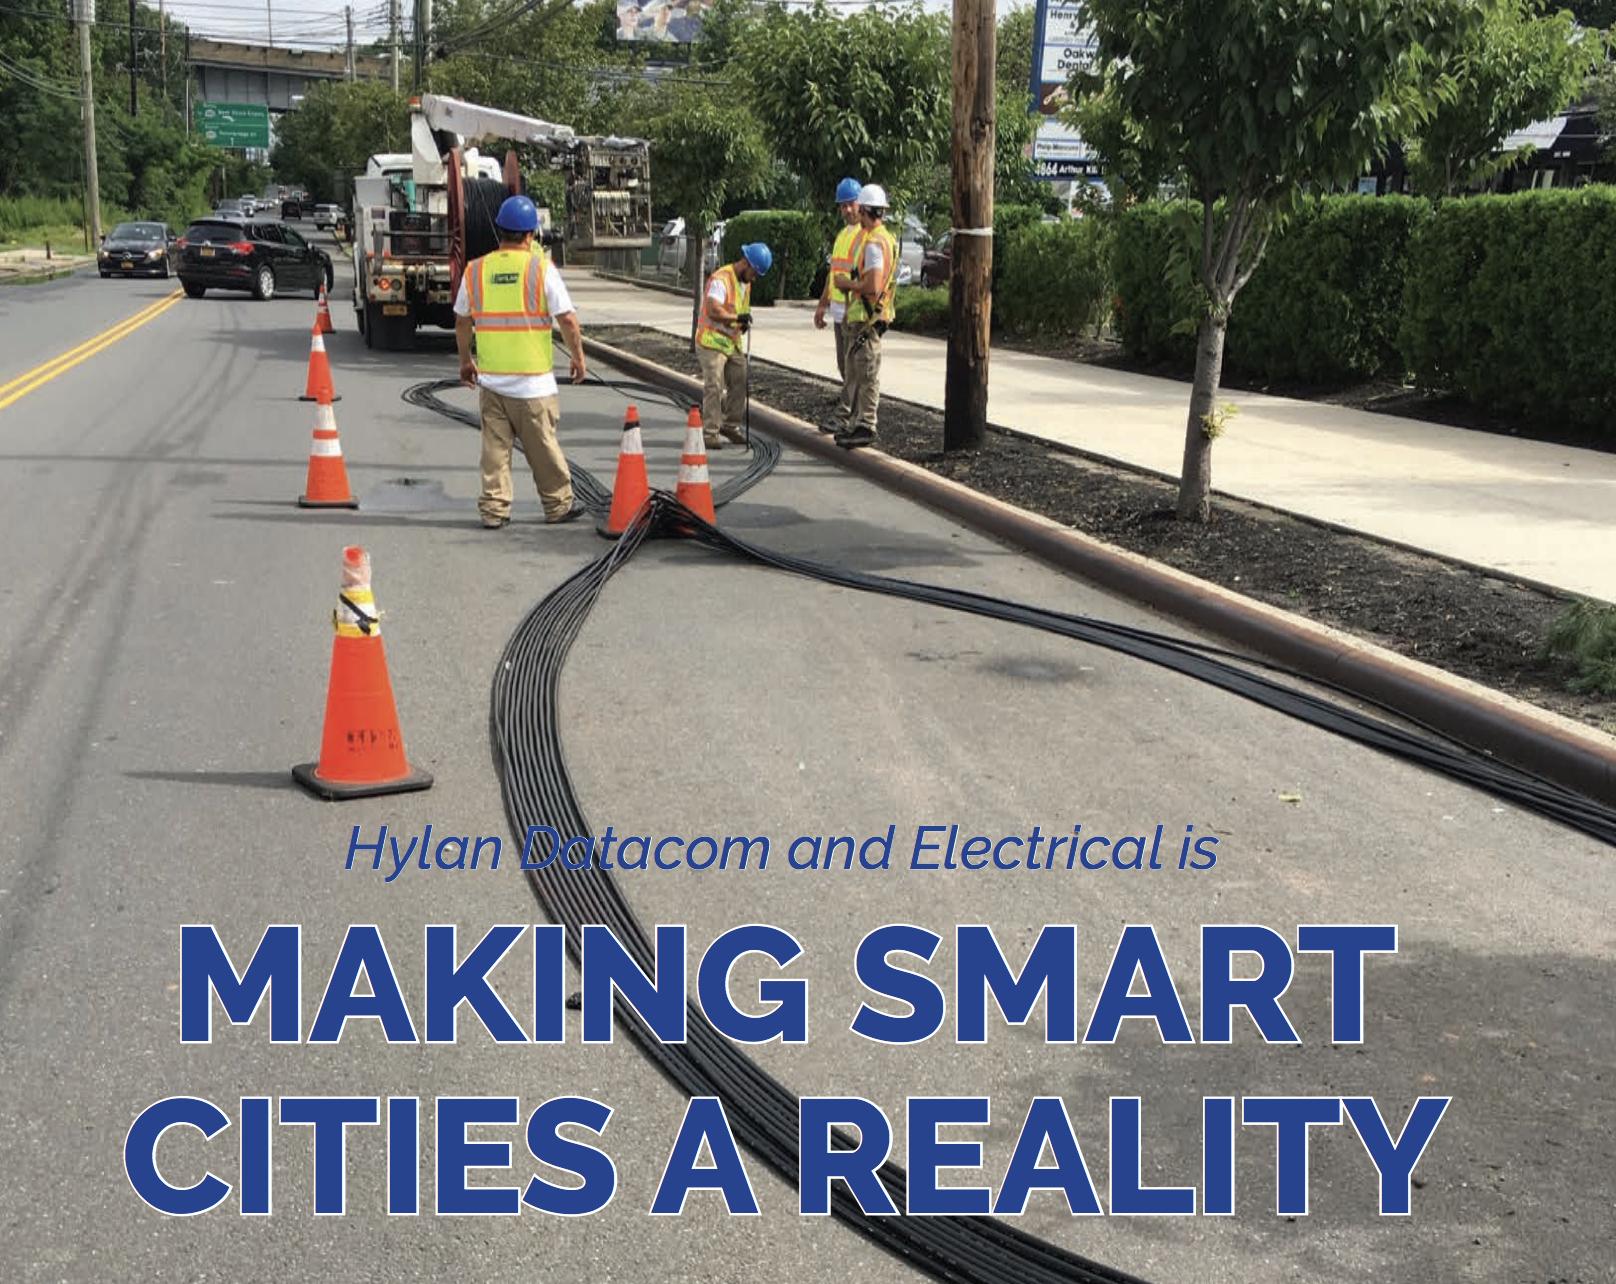 Hylan: Making Smart Cities a Reality